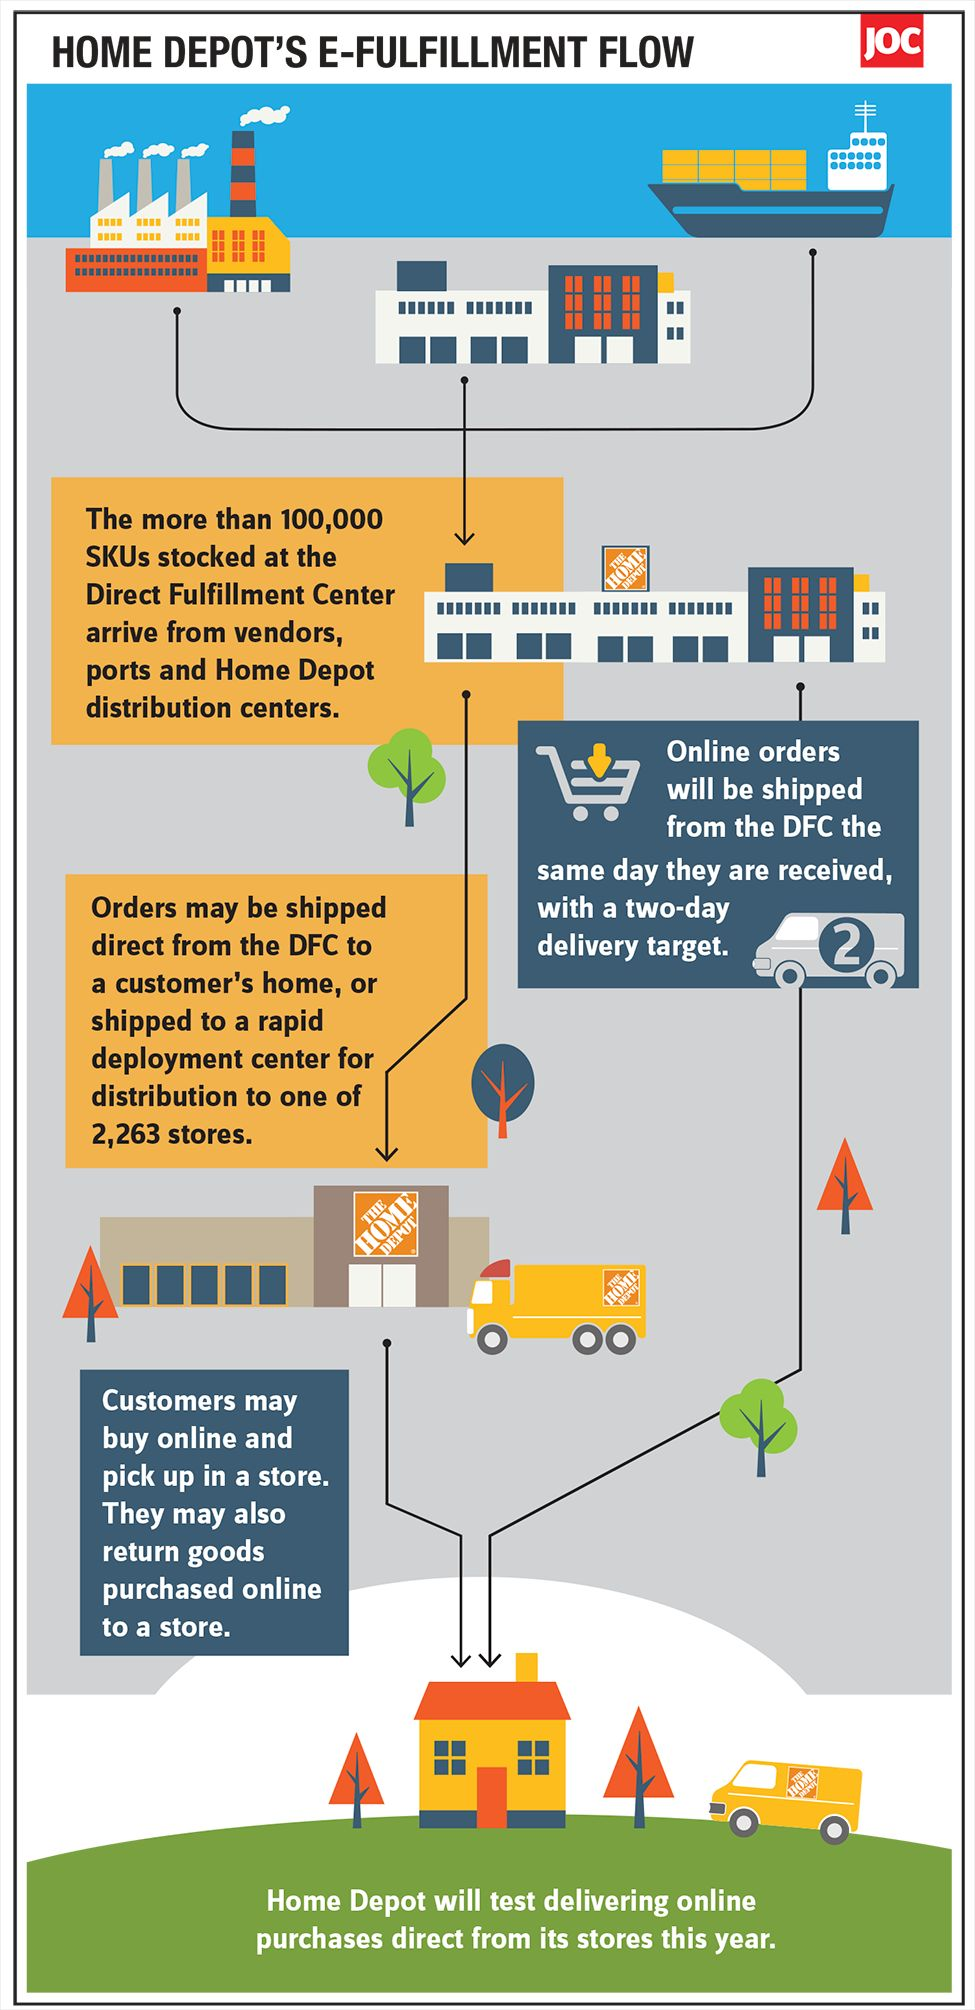 medium resolution of home depot opens second fulfillment center dedicated to e commerce rh joc com dodge journey radio wiring diagram niagara falls diagram